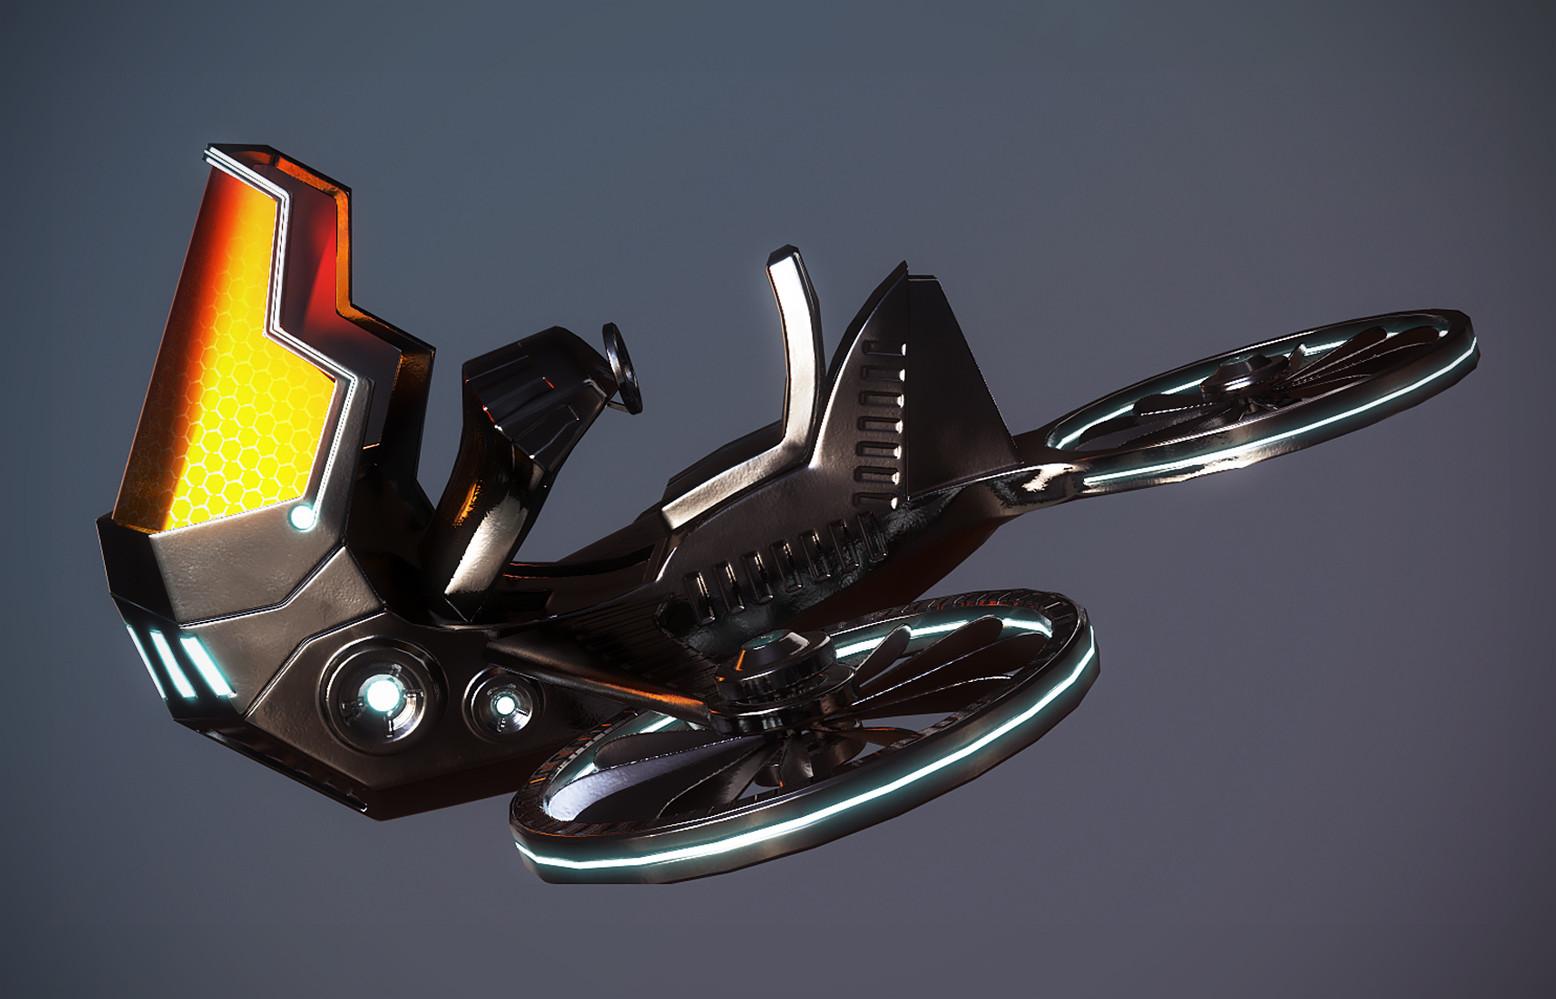 летающий мотоцикл картинка быстро, много пара